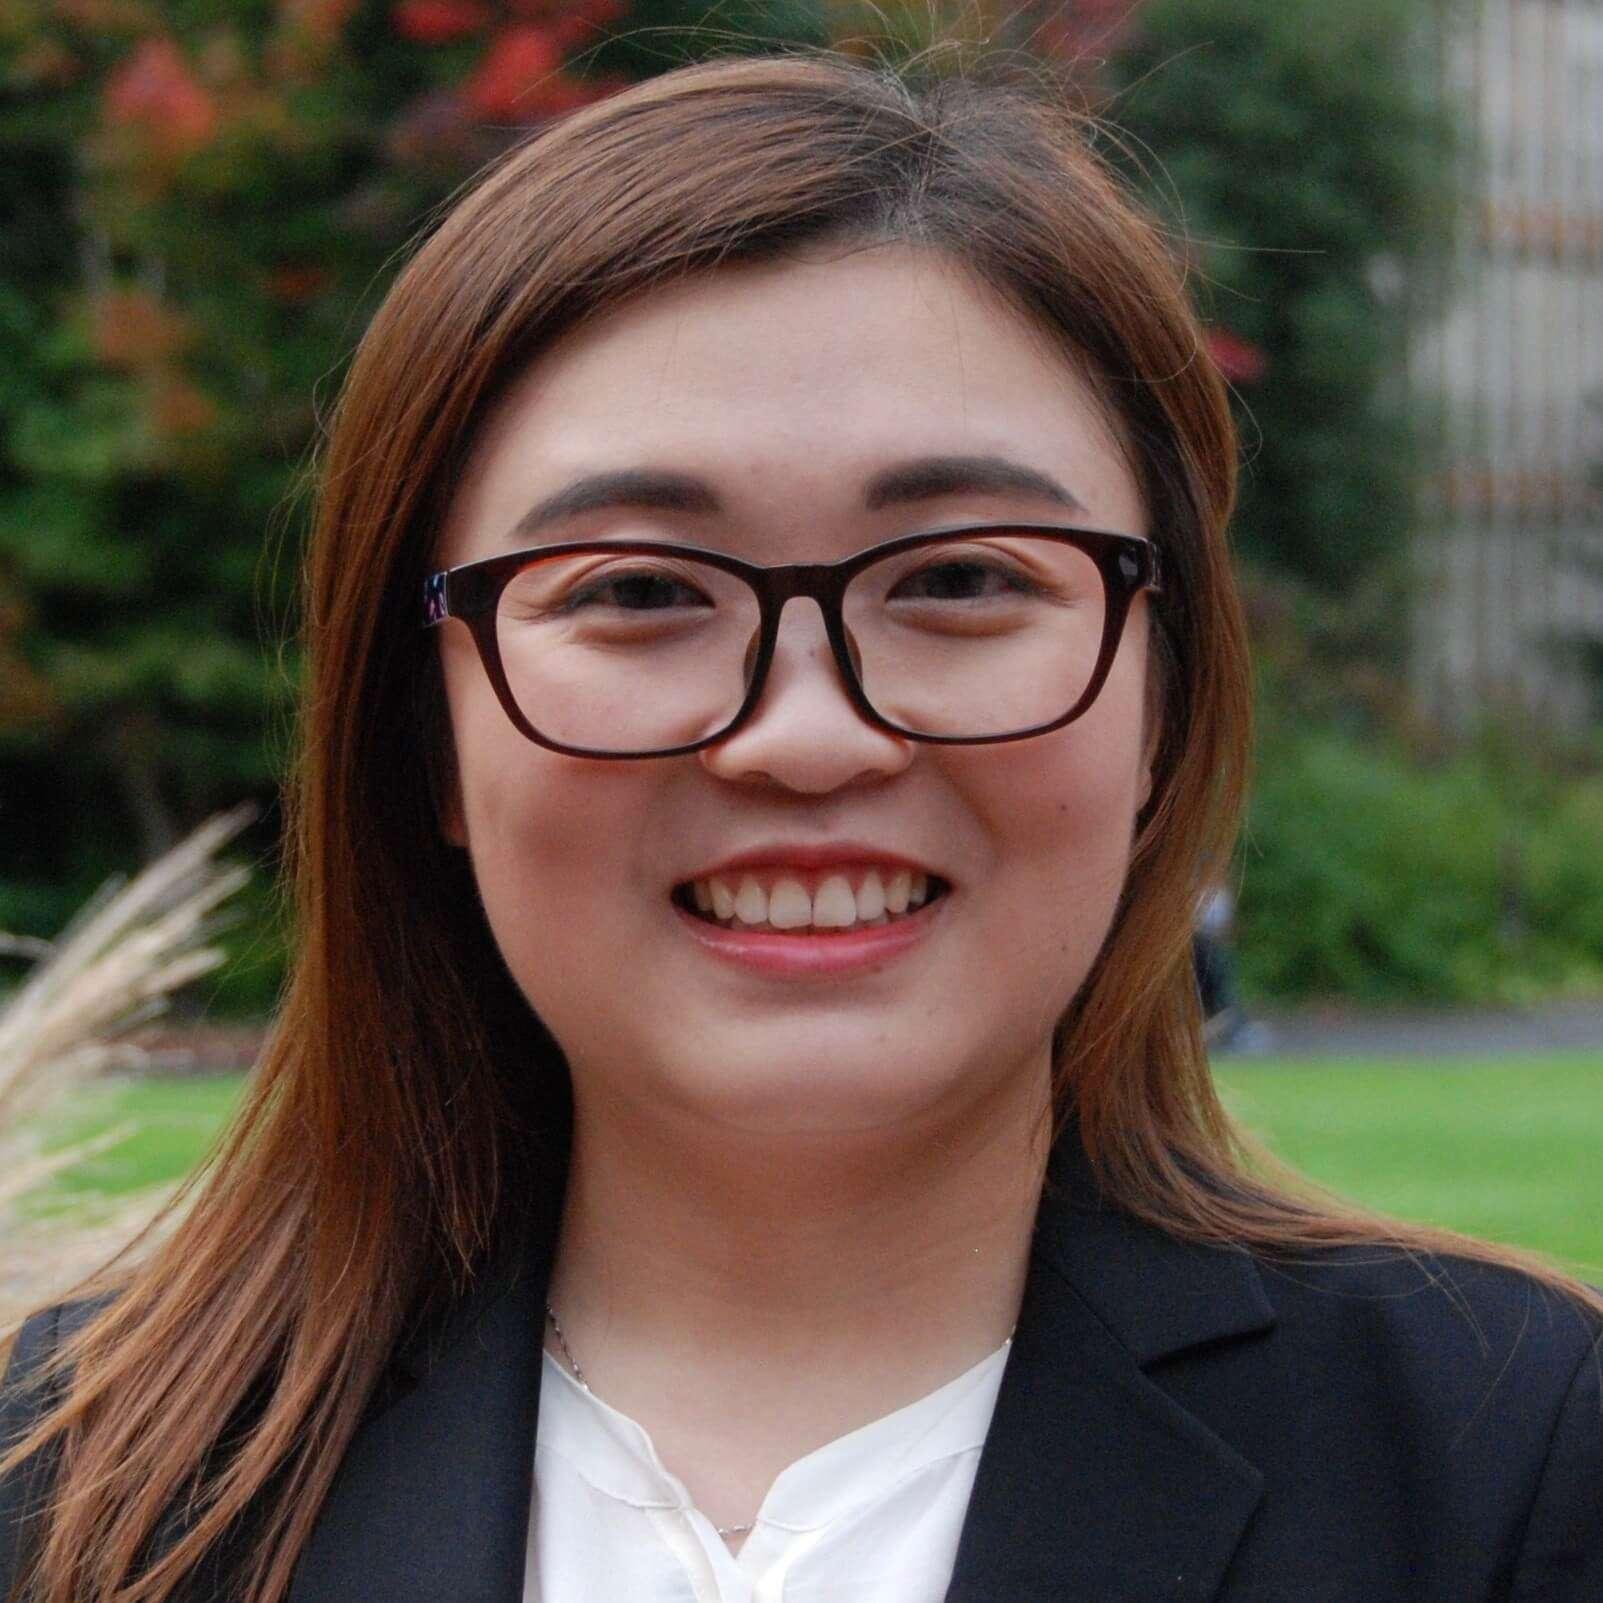 Jingting Wu : Graduate Student